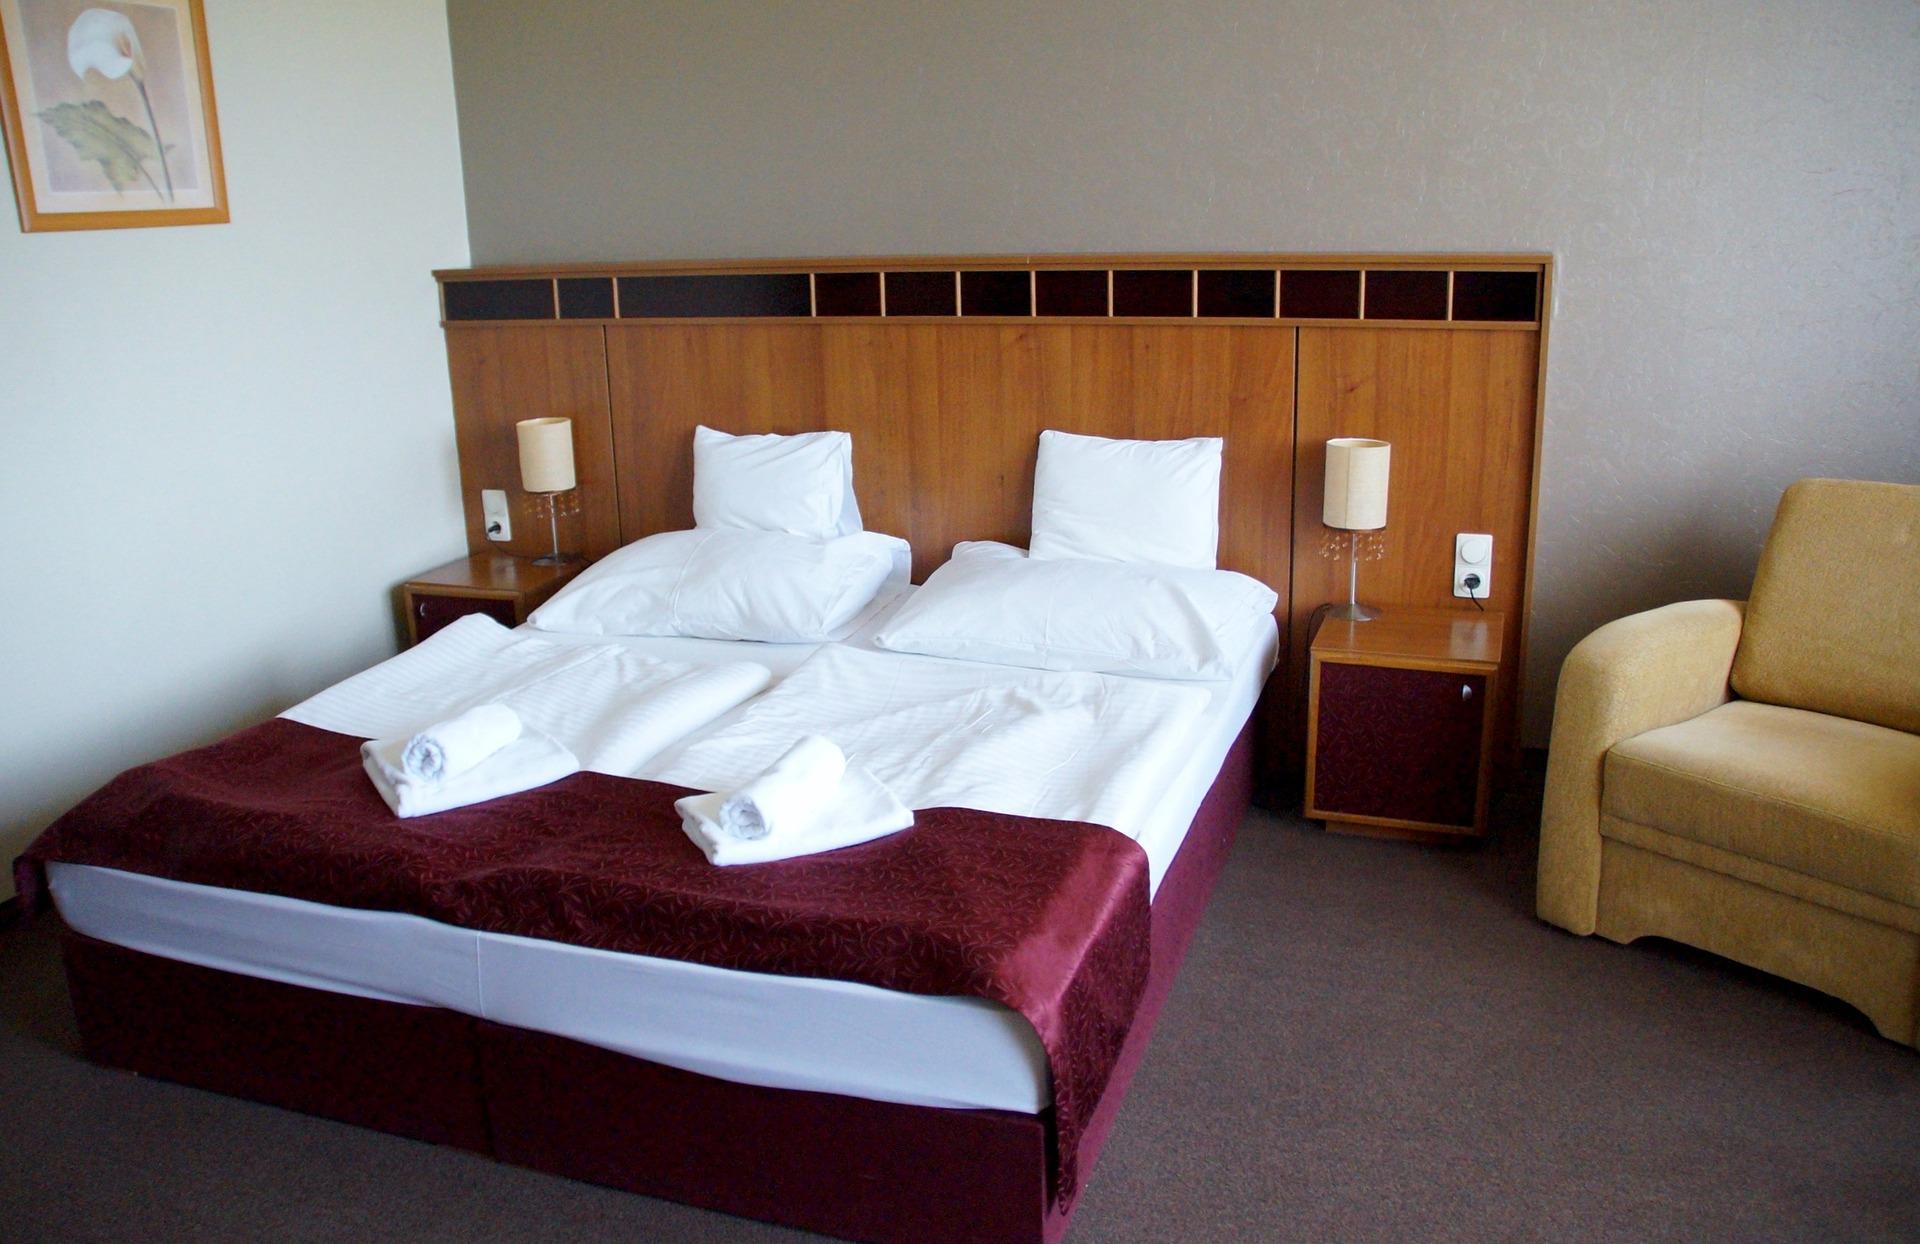 hotelroom-994226_1920.jpg